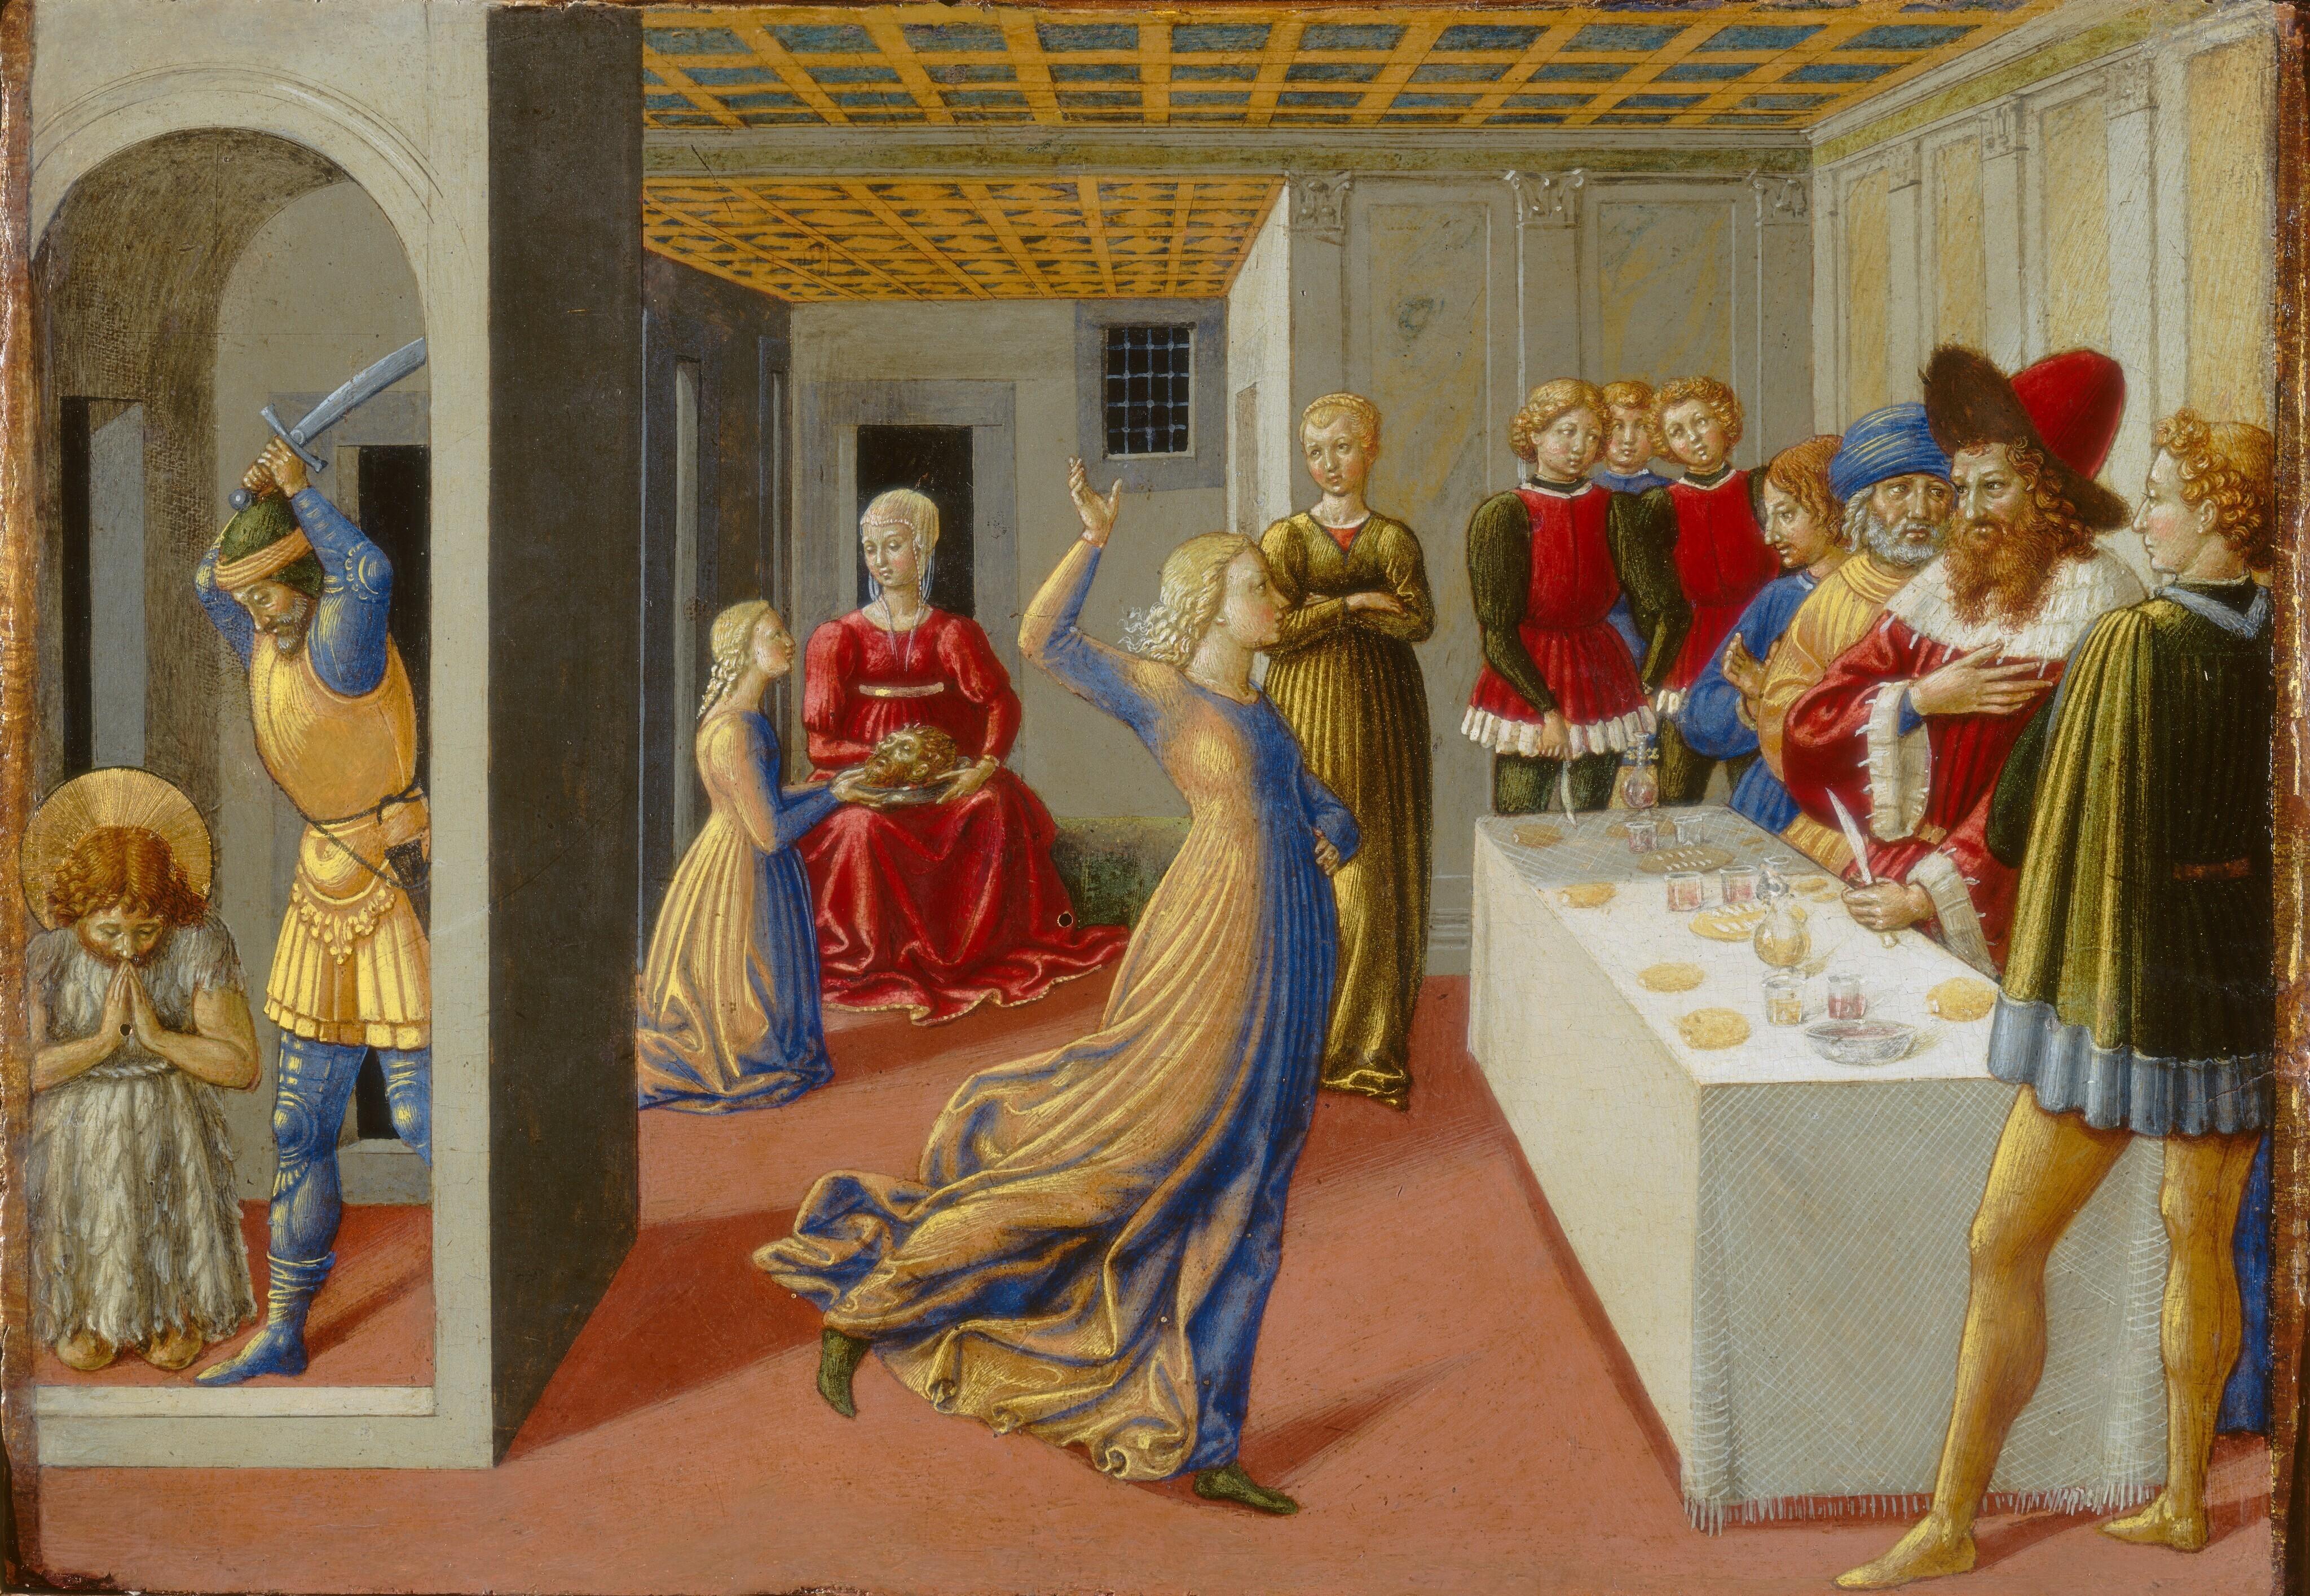 Benozzo Gozzoli : The beheading of John the Baptist